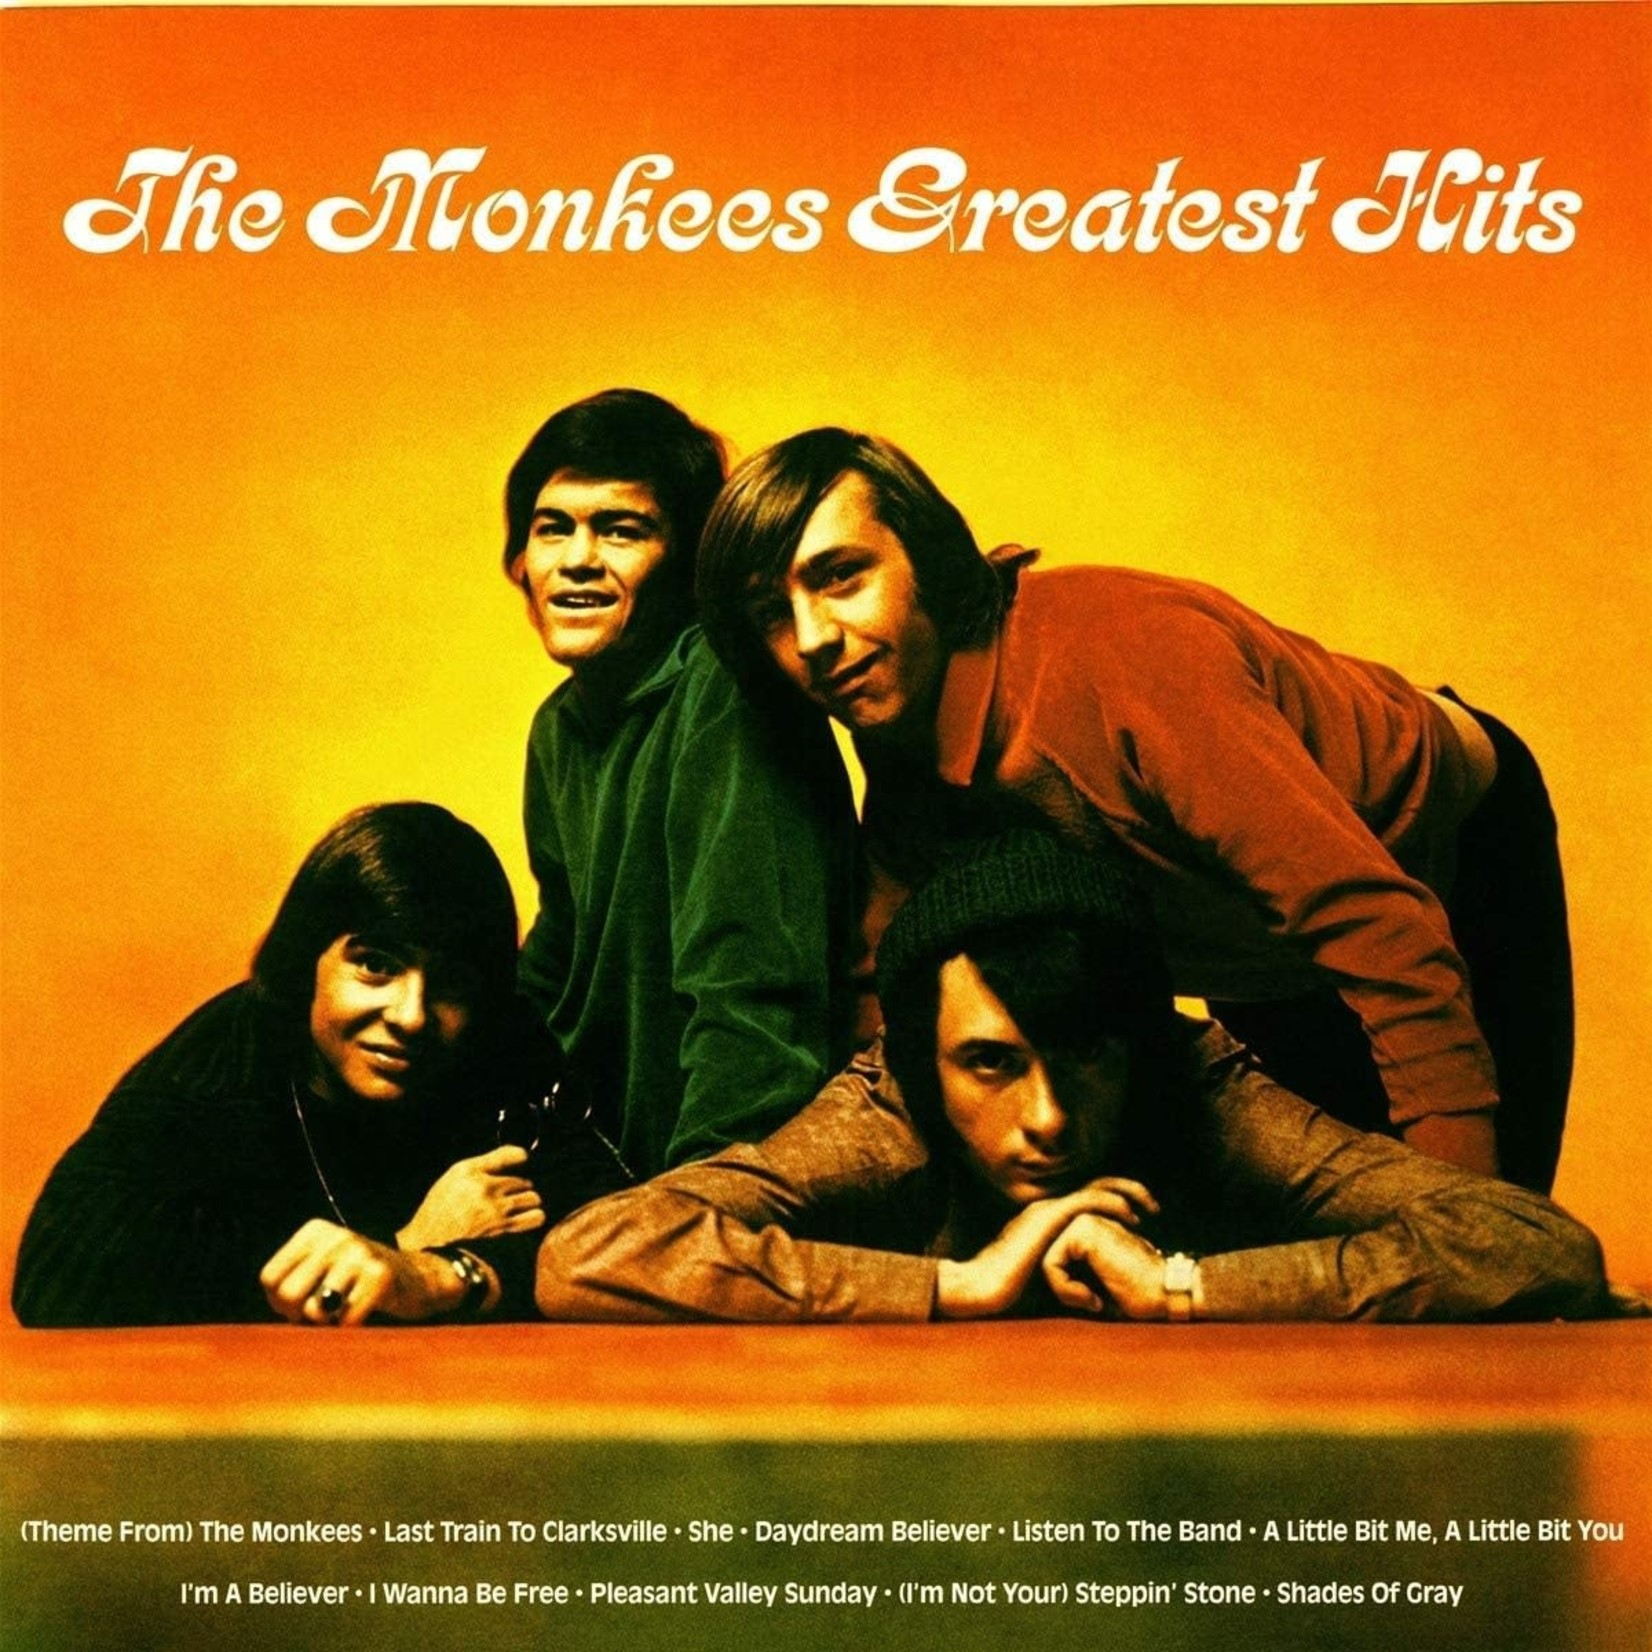 [Vintage] Monkees: Greatest Hits